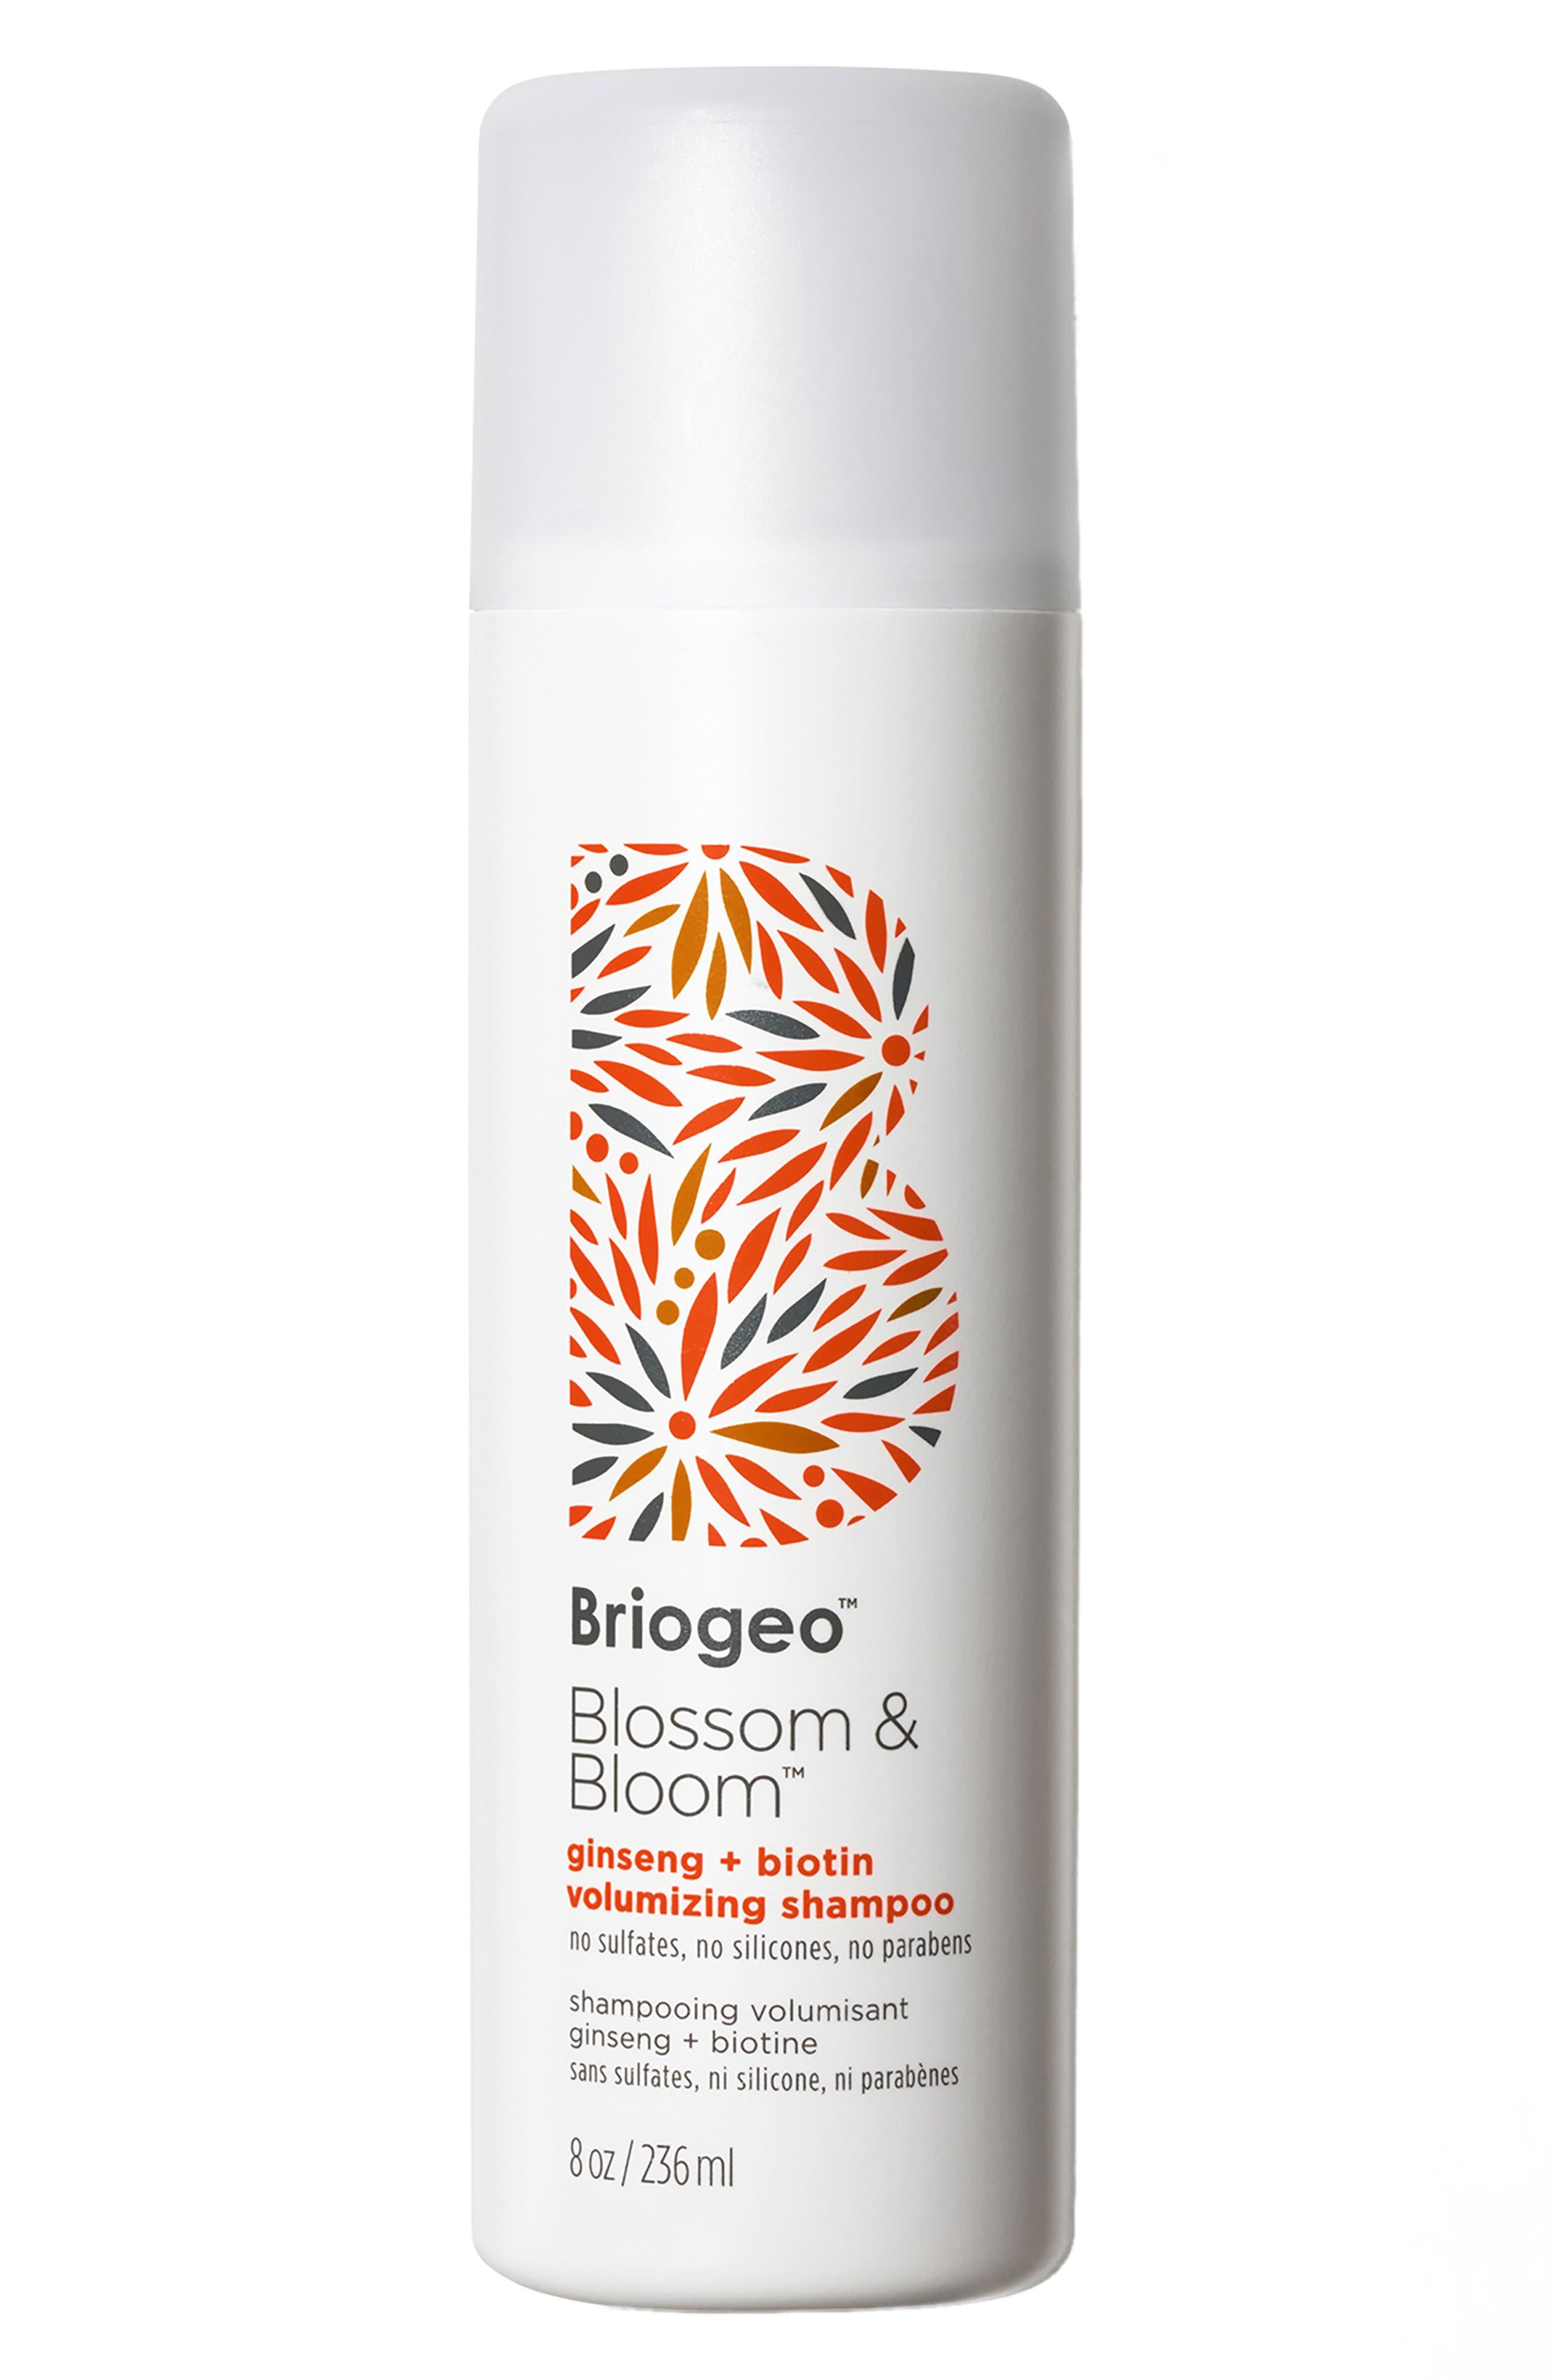 Blossom & Bloom Ginseng + Biotin Volumizing Shampoo